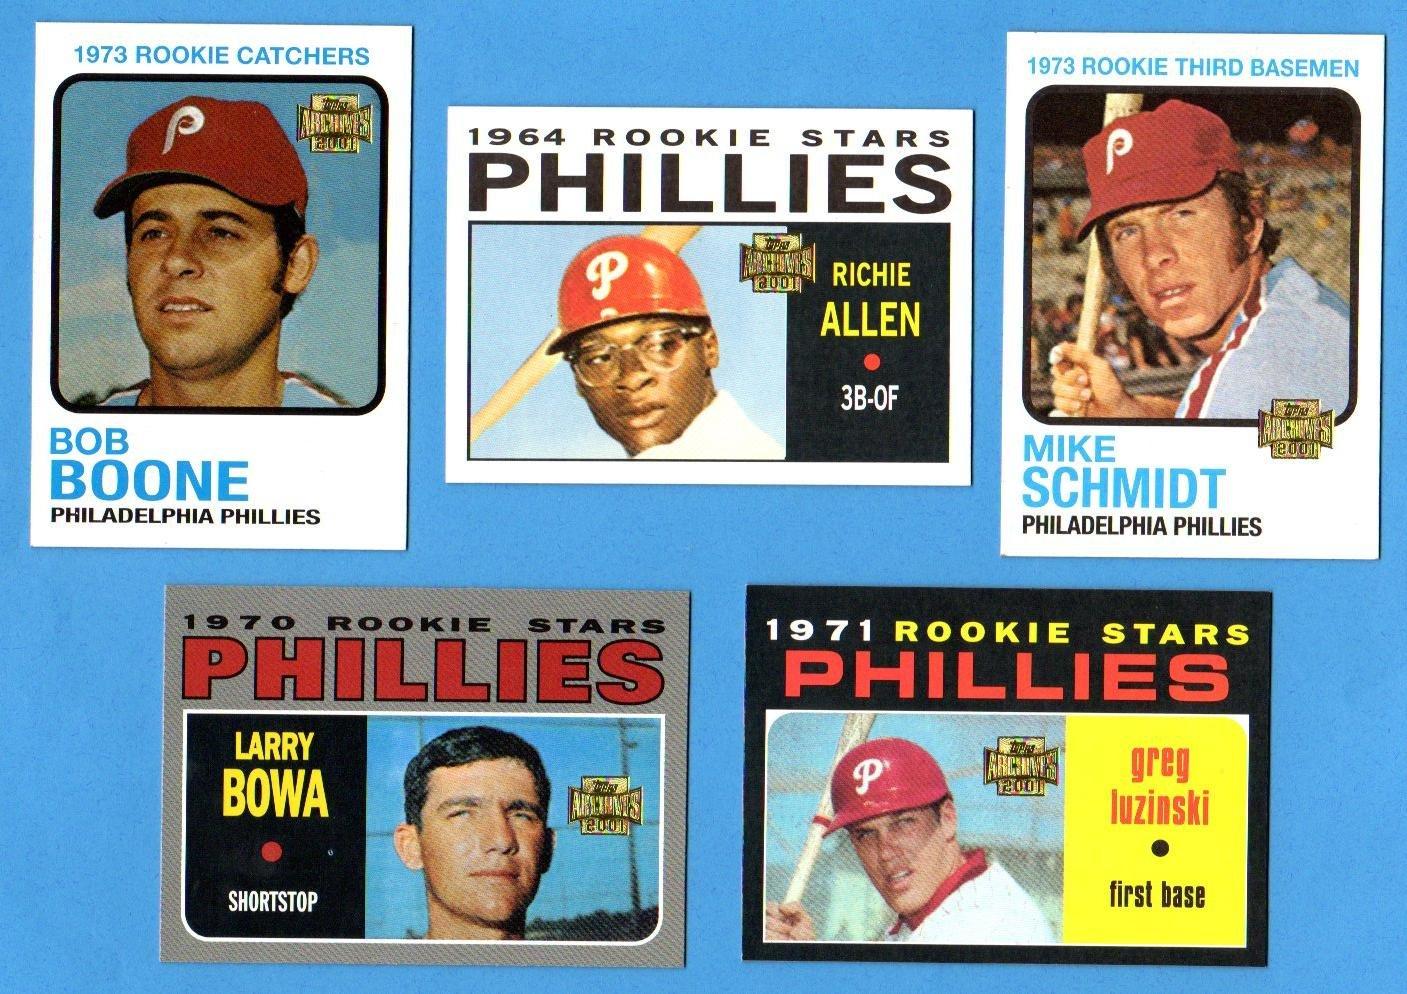 Philadelphia Phillies 5 Card Topps Rookie Reprint Lot 1